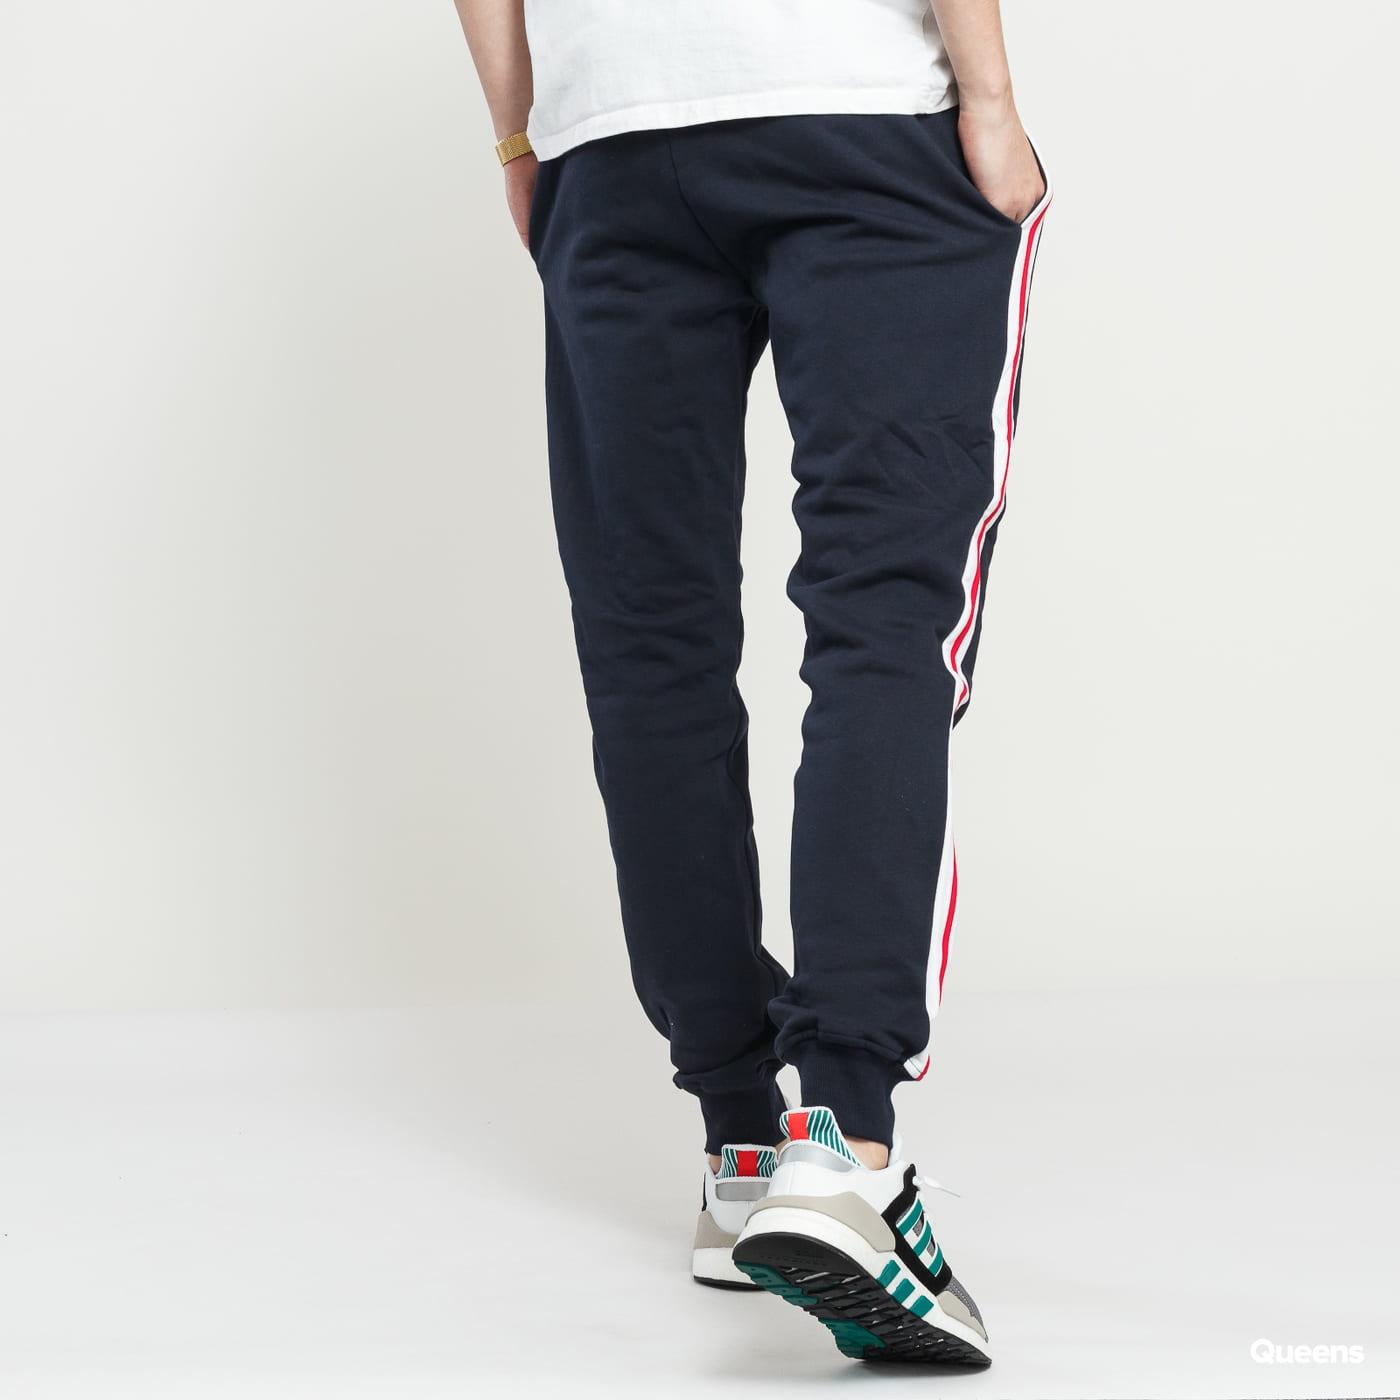 Urban Classics 3-Tone Side Stripe Terry Pants navy / biele / červené